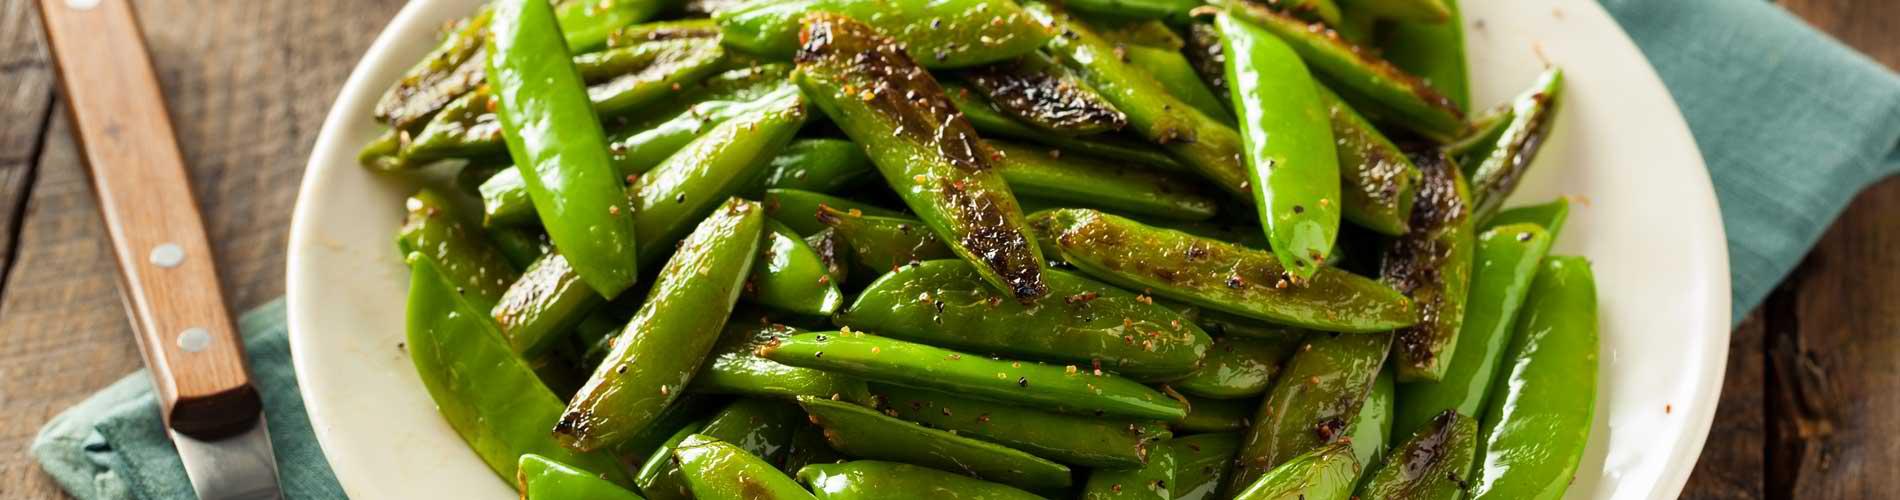 Sauteed Snap Peas